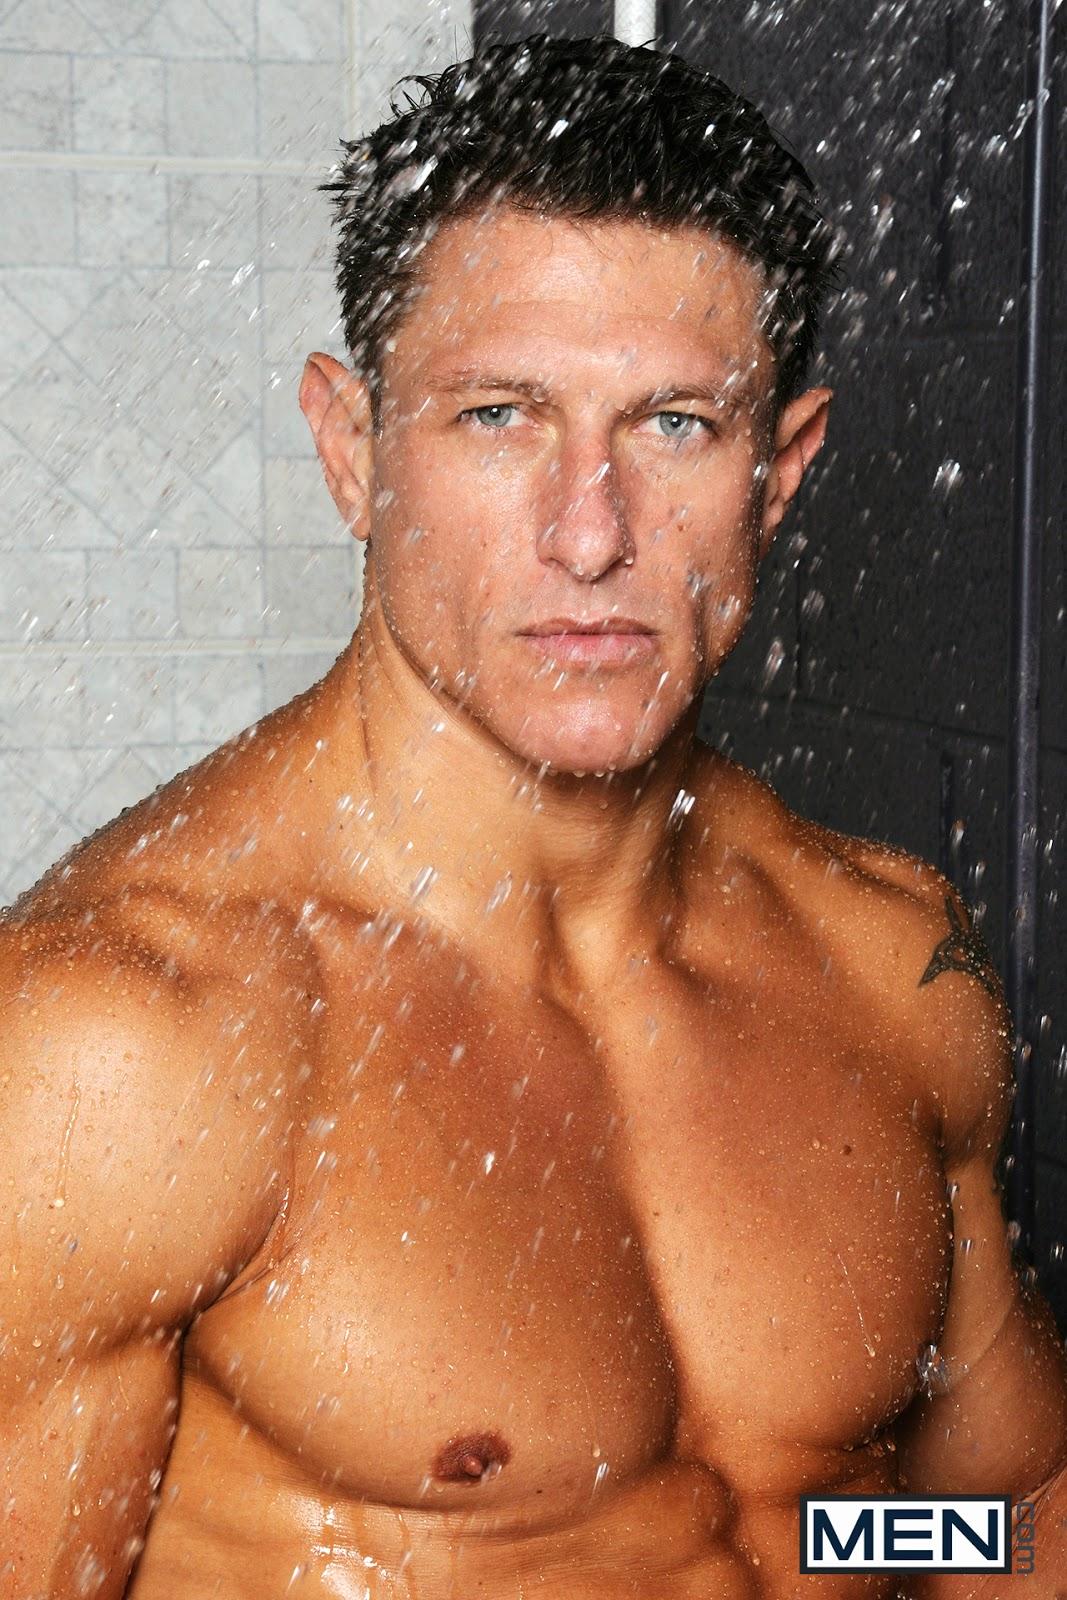 Actor Porno Gay Bryce Evans xtasis : un foro de hombres para hombres